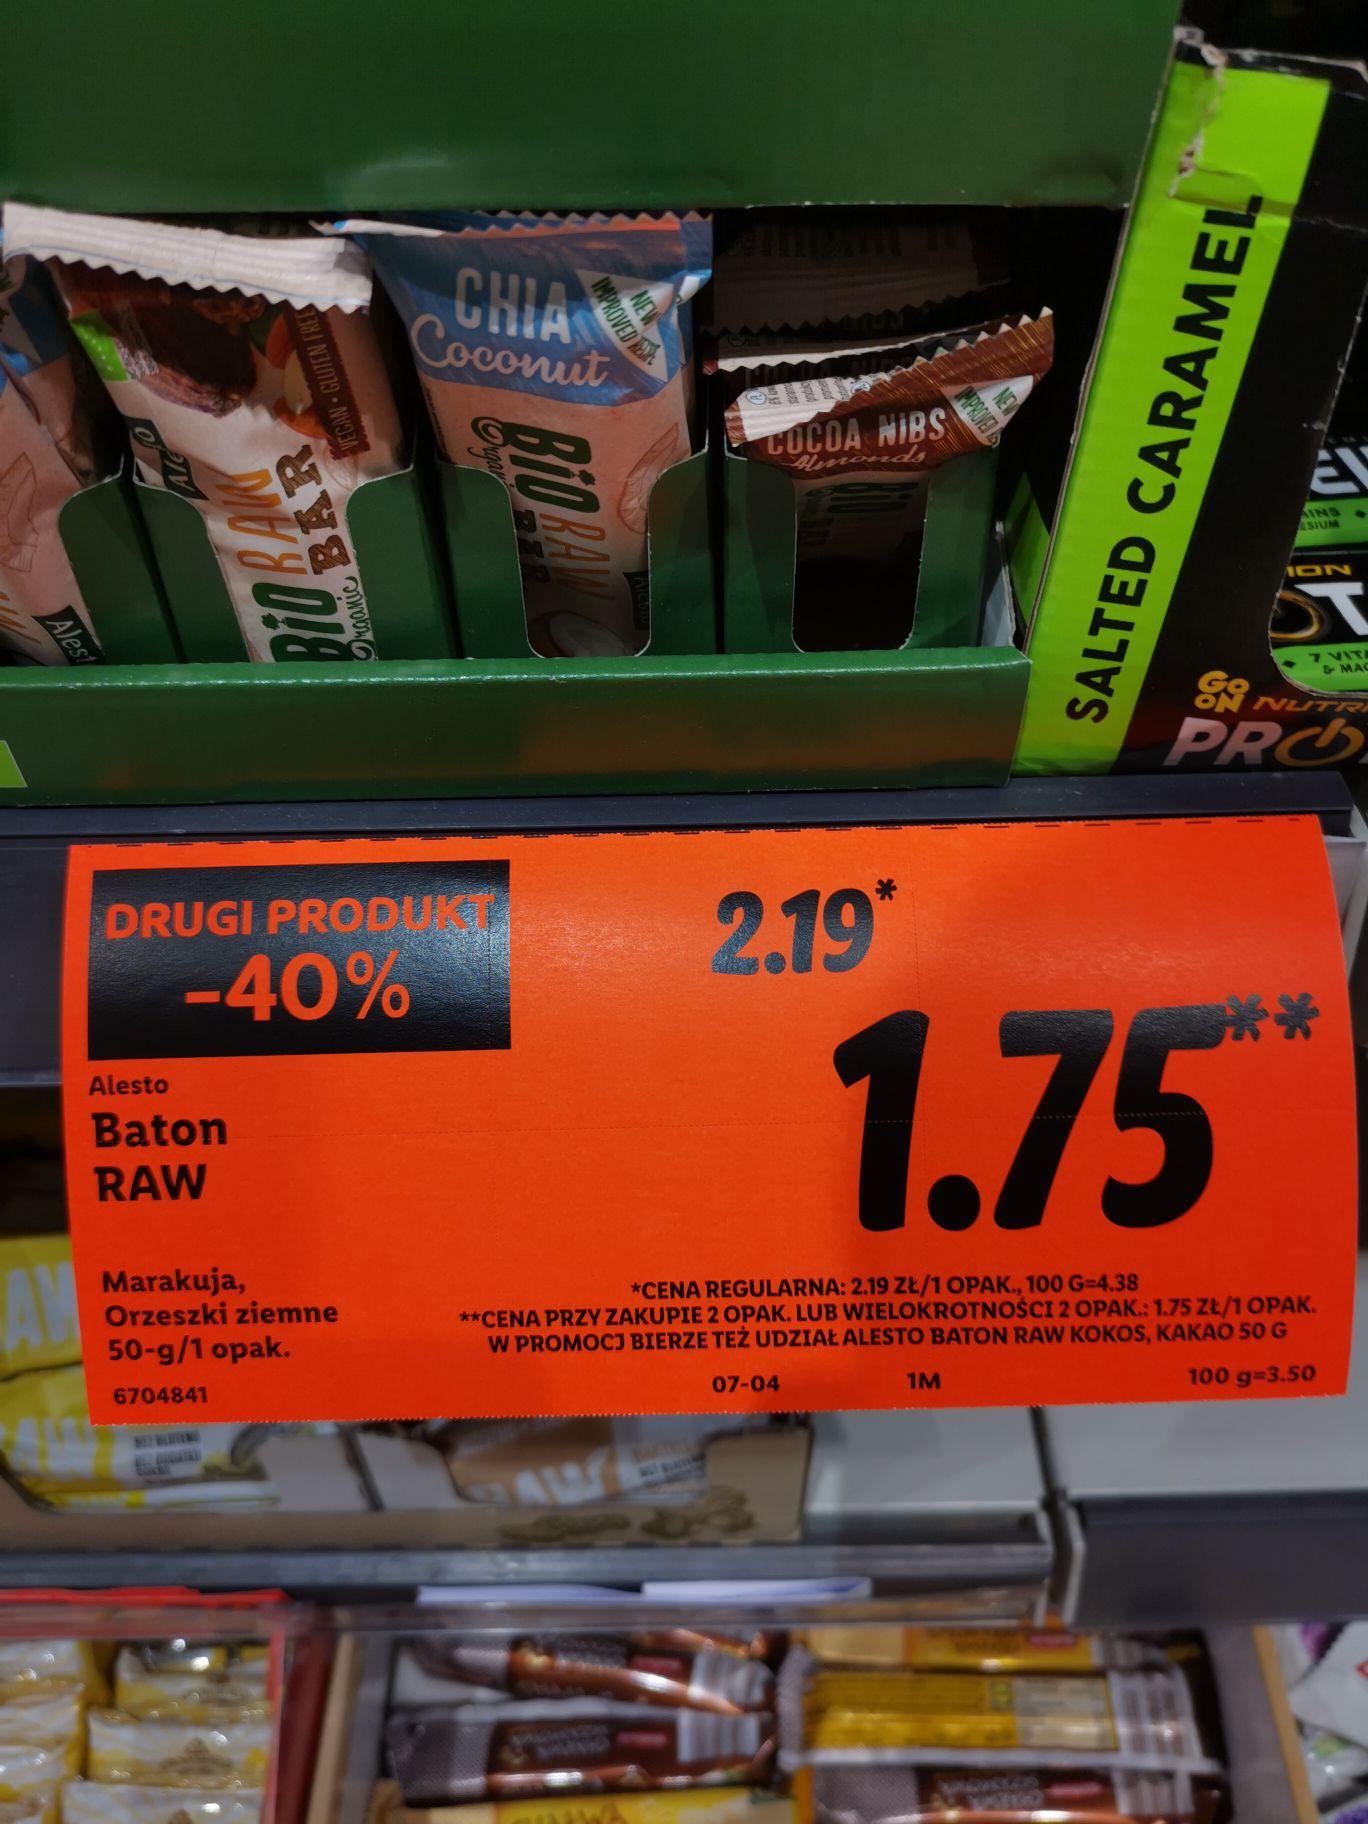 Lidl - Baton RAW drugi produkt za 40%